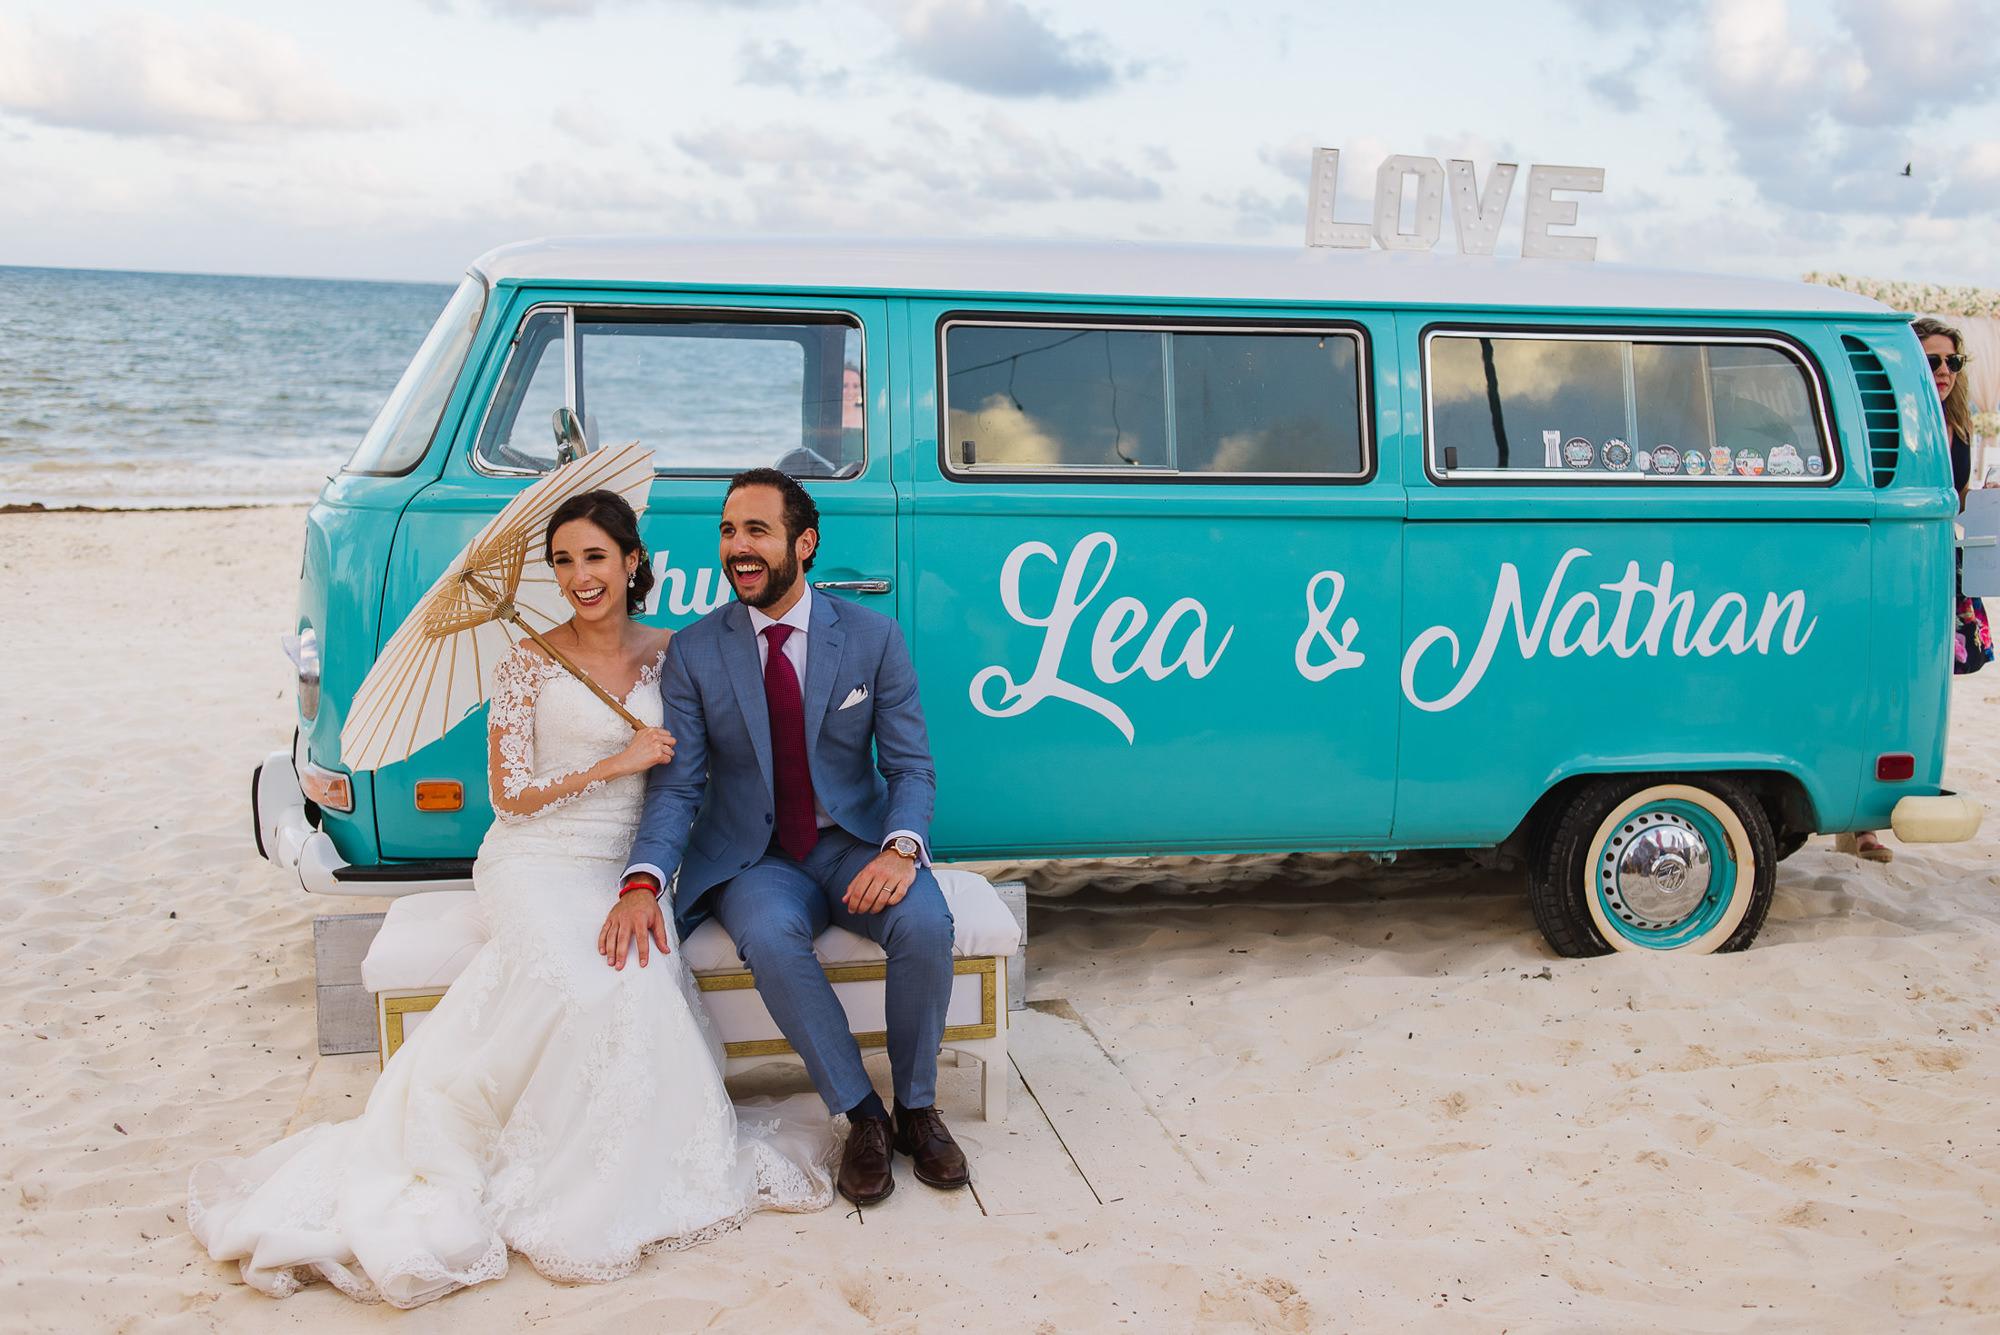 bride-and-groom-teal-van-decor-worlds-best-wedding-photos-citlalli-rico-mexico-wedding-photographers